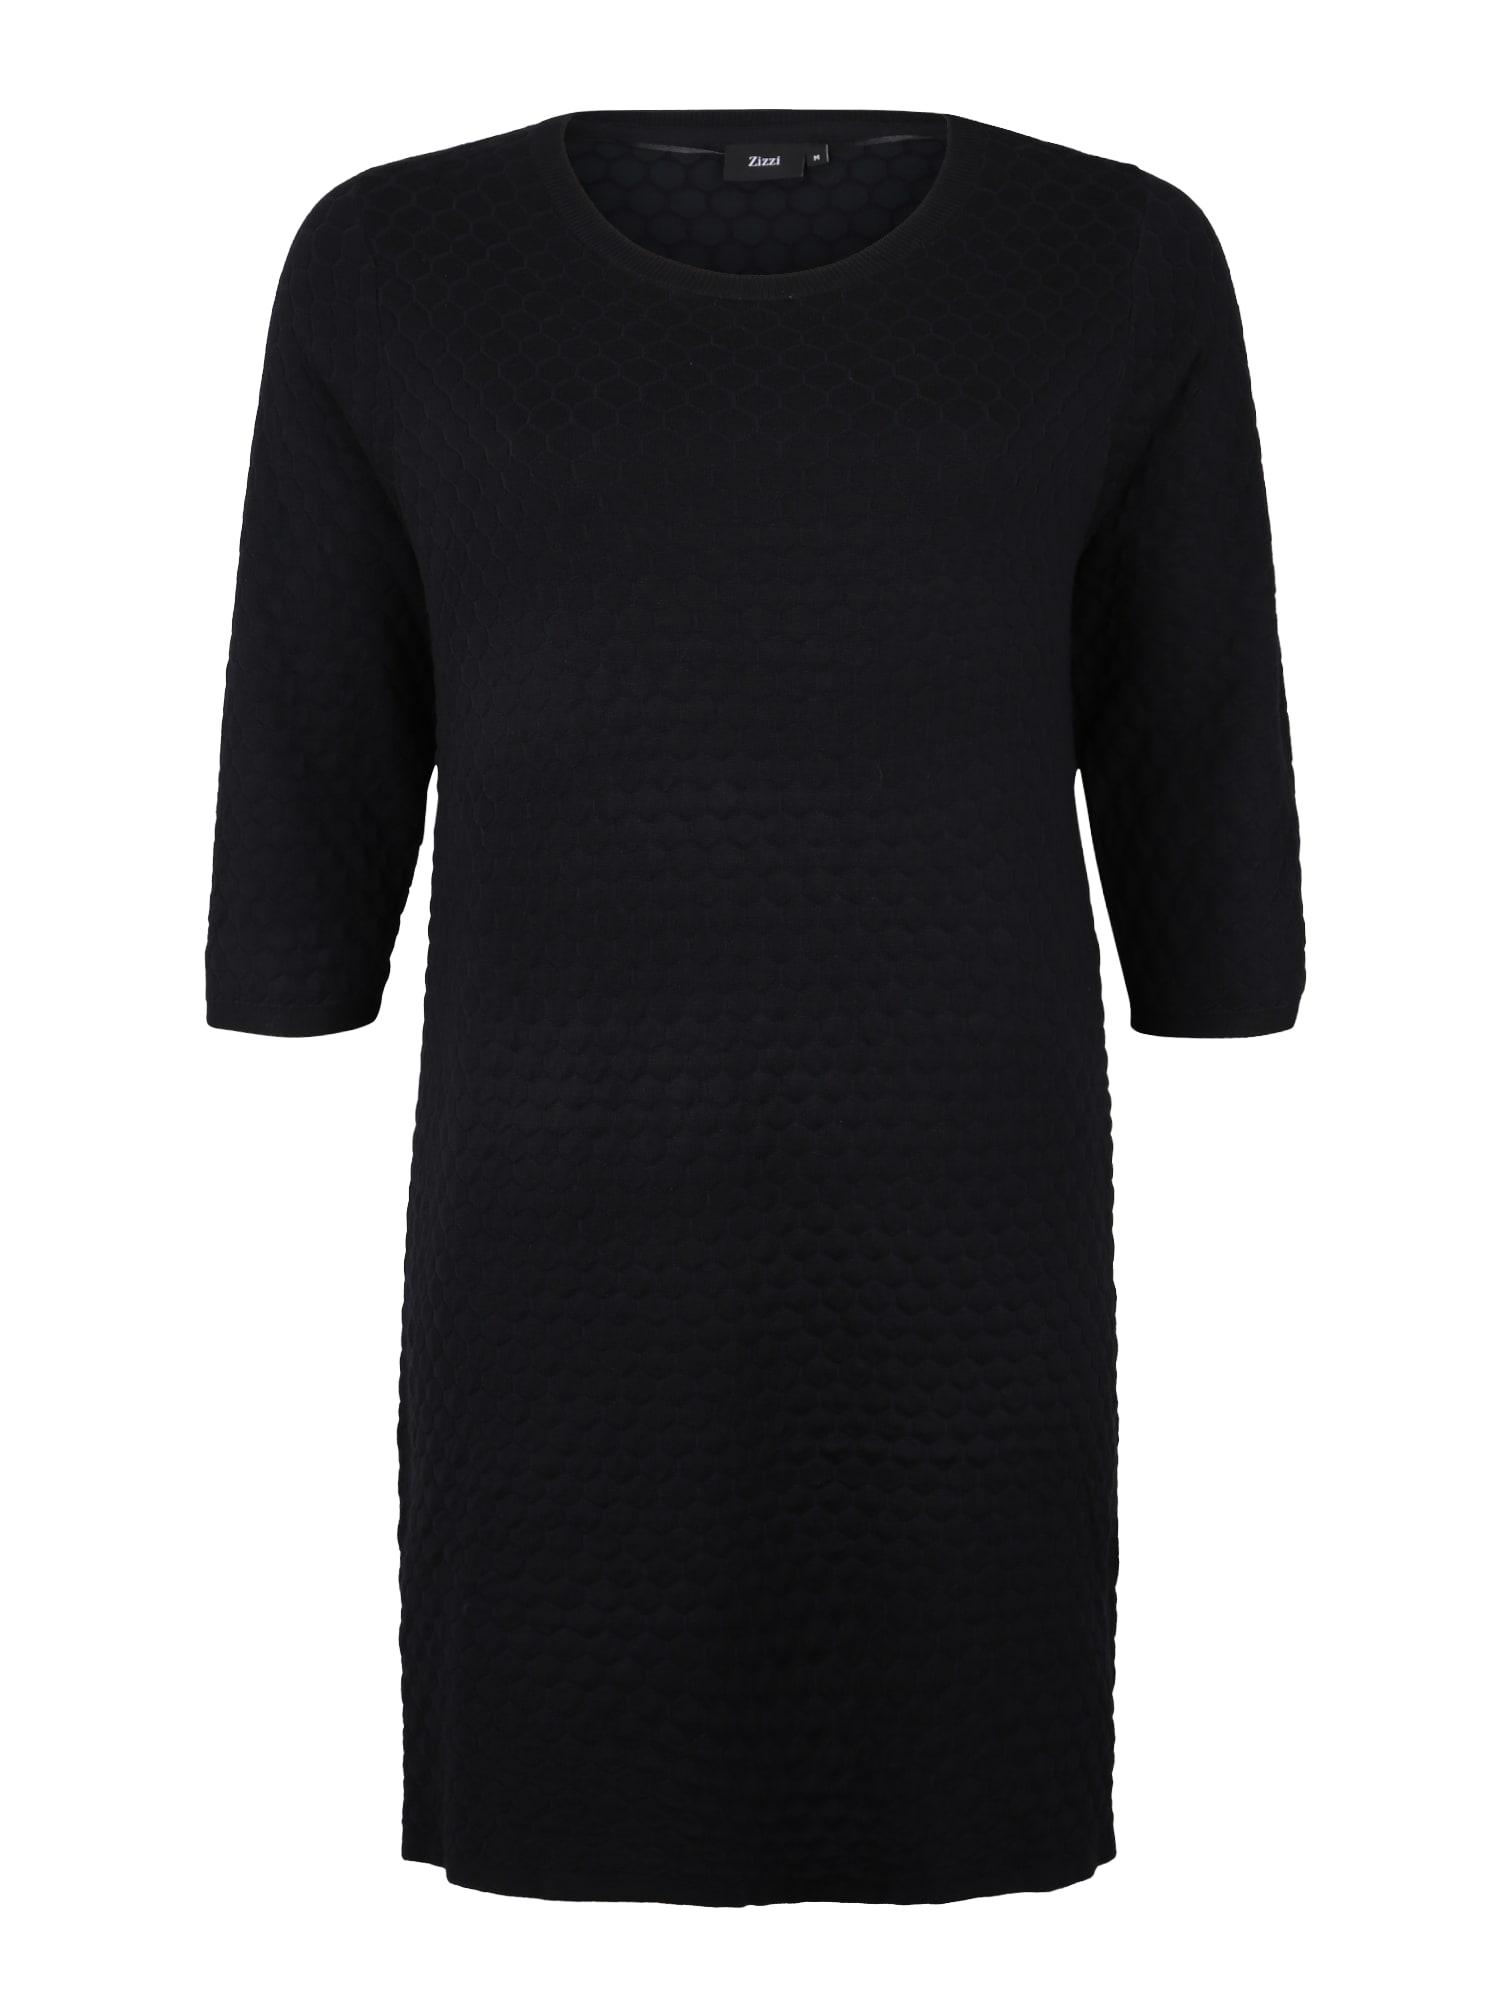 Šaty MCARRIELSDIAMOND DRESS černá Zizzi